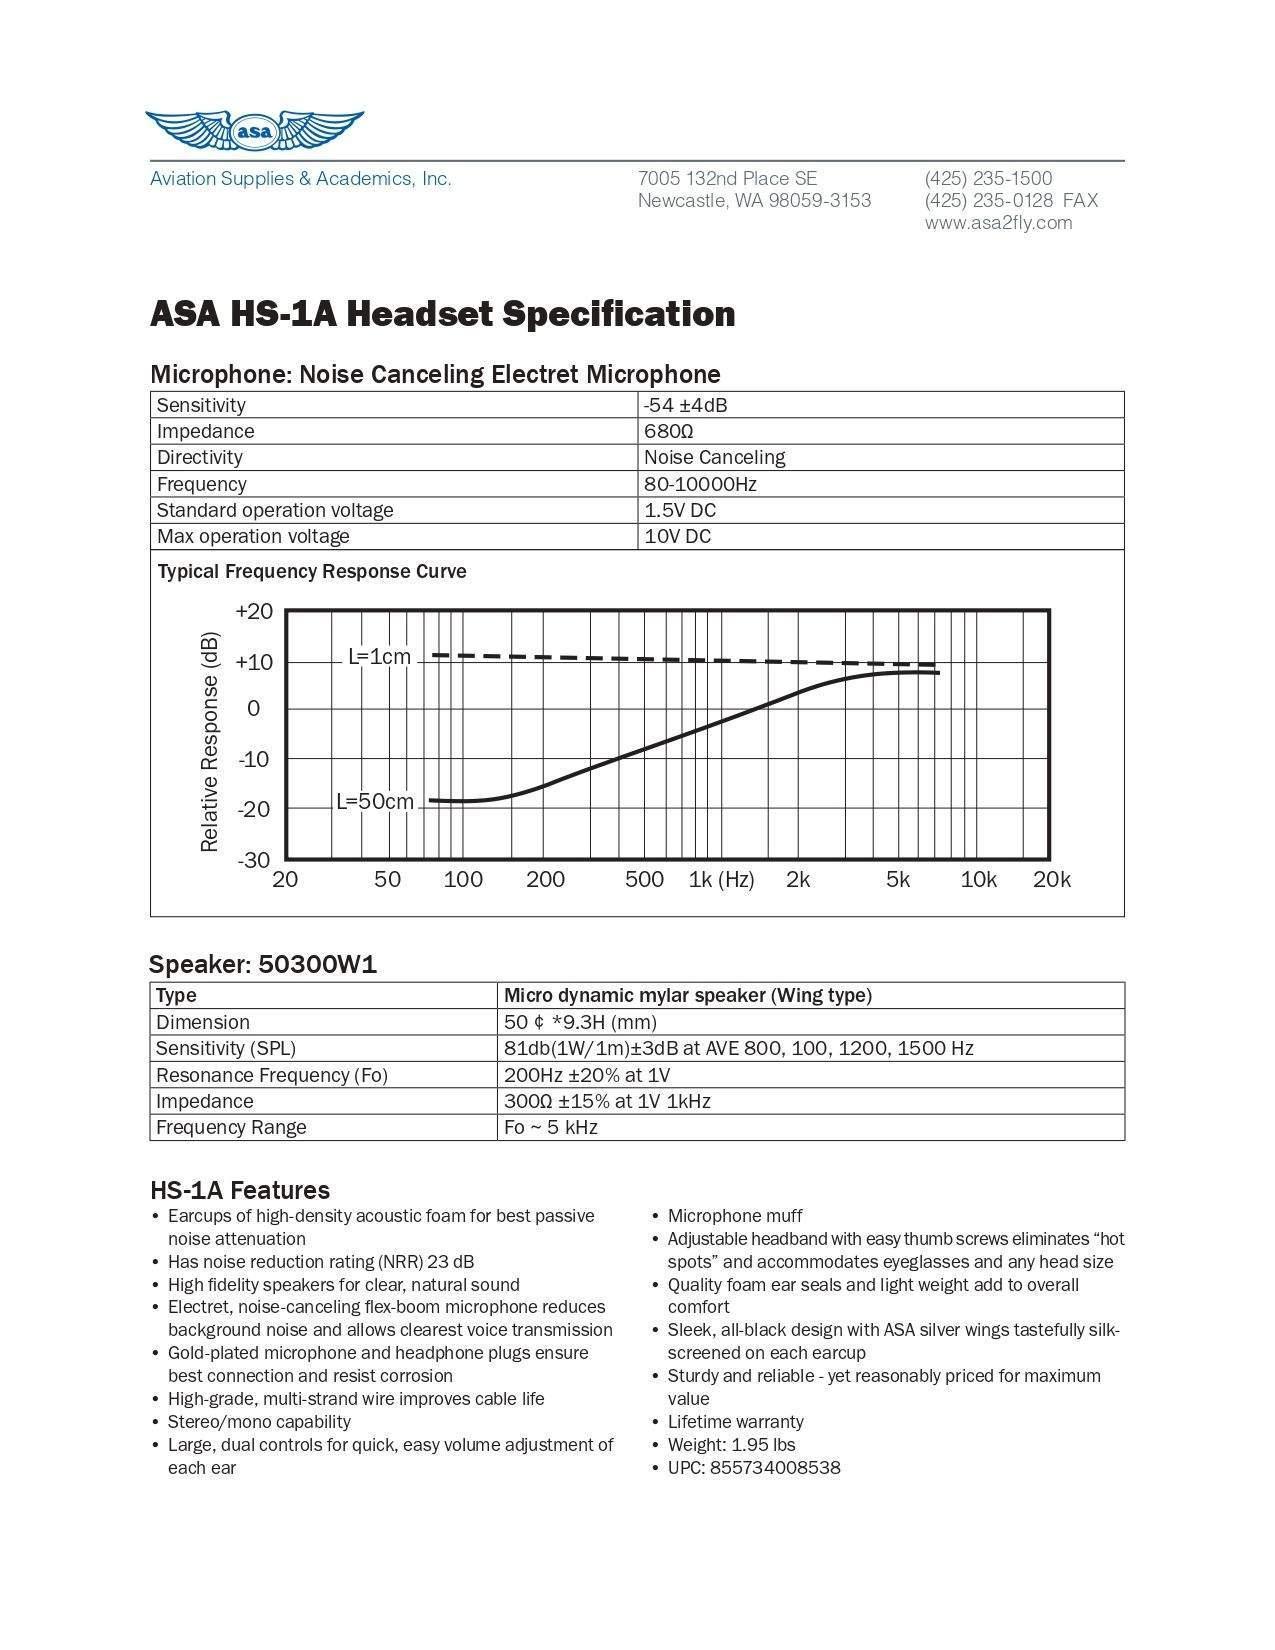 HS-1 DATASHEET BUCKERBOOK